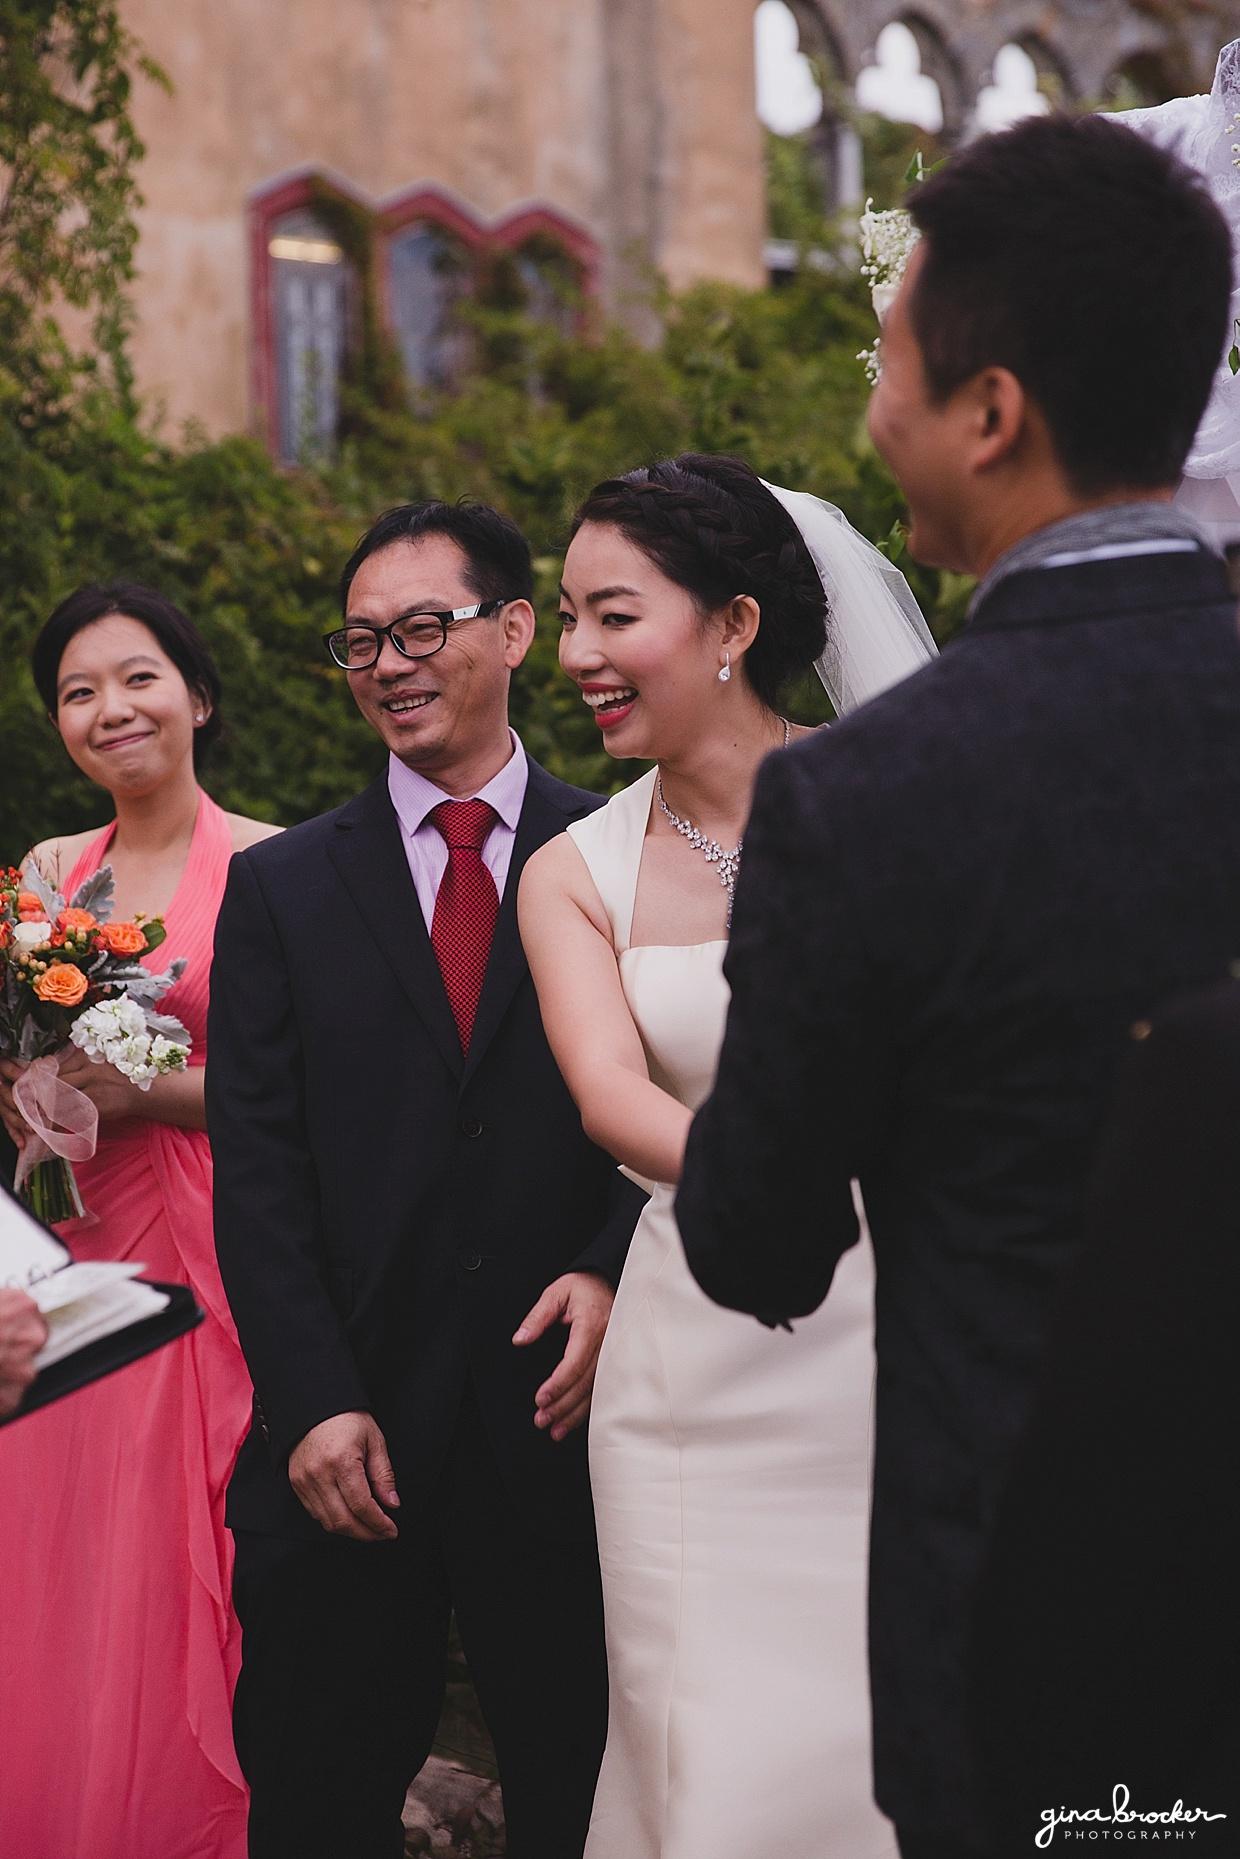 The bride smiles during her outdoor wedding ceremony in Hammond Castle